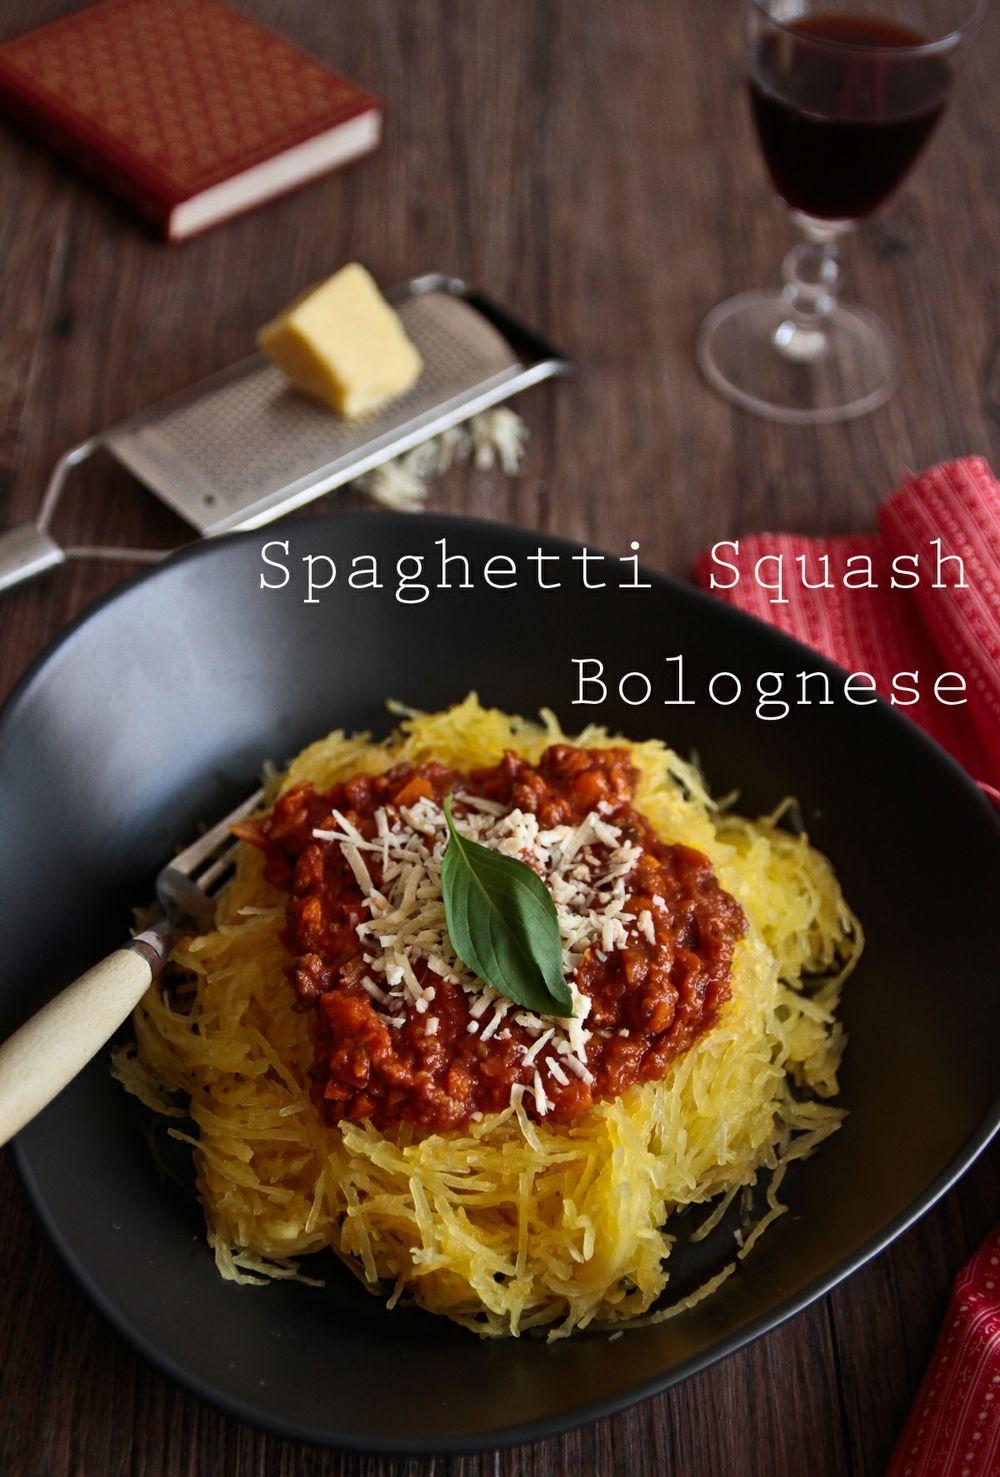 m-spaghetti-squash-1-3